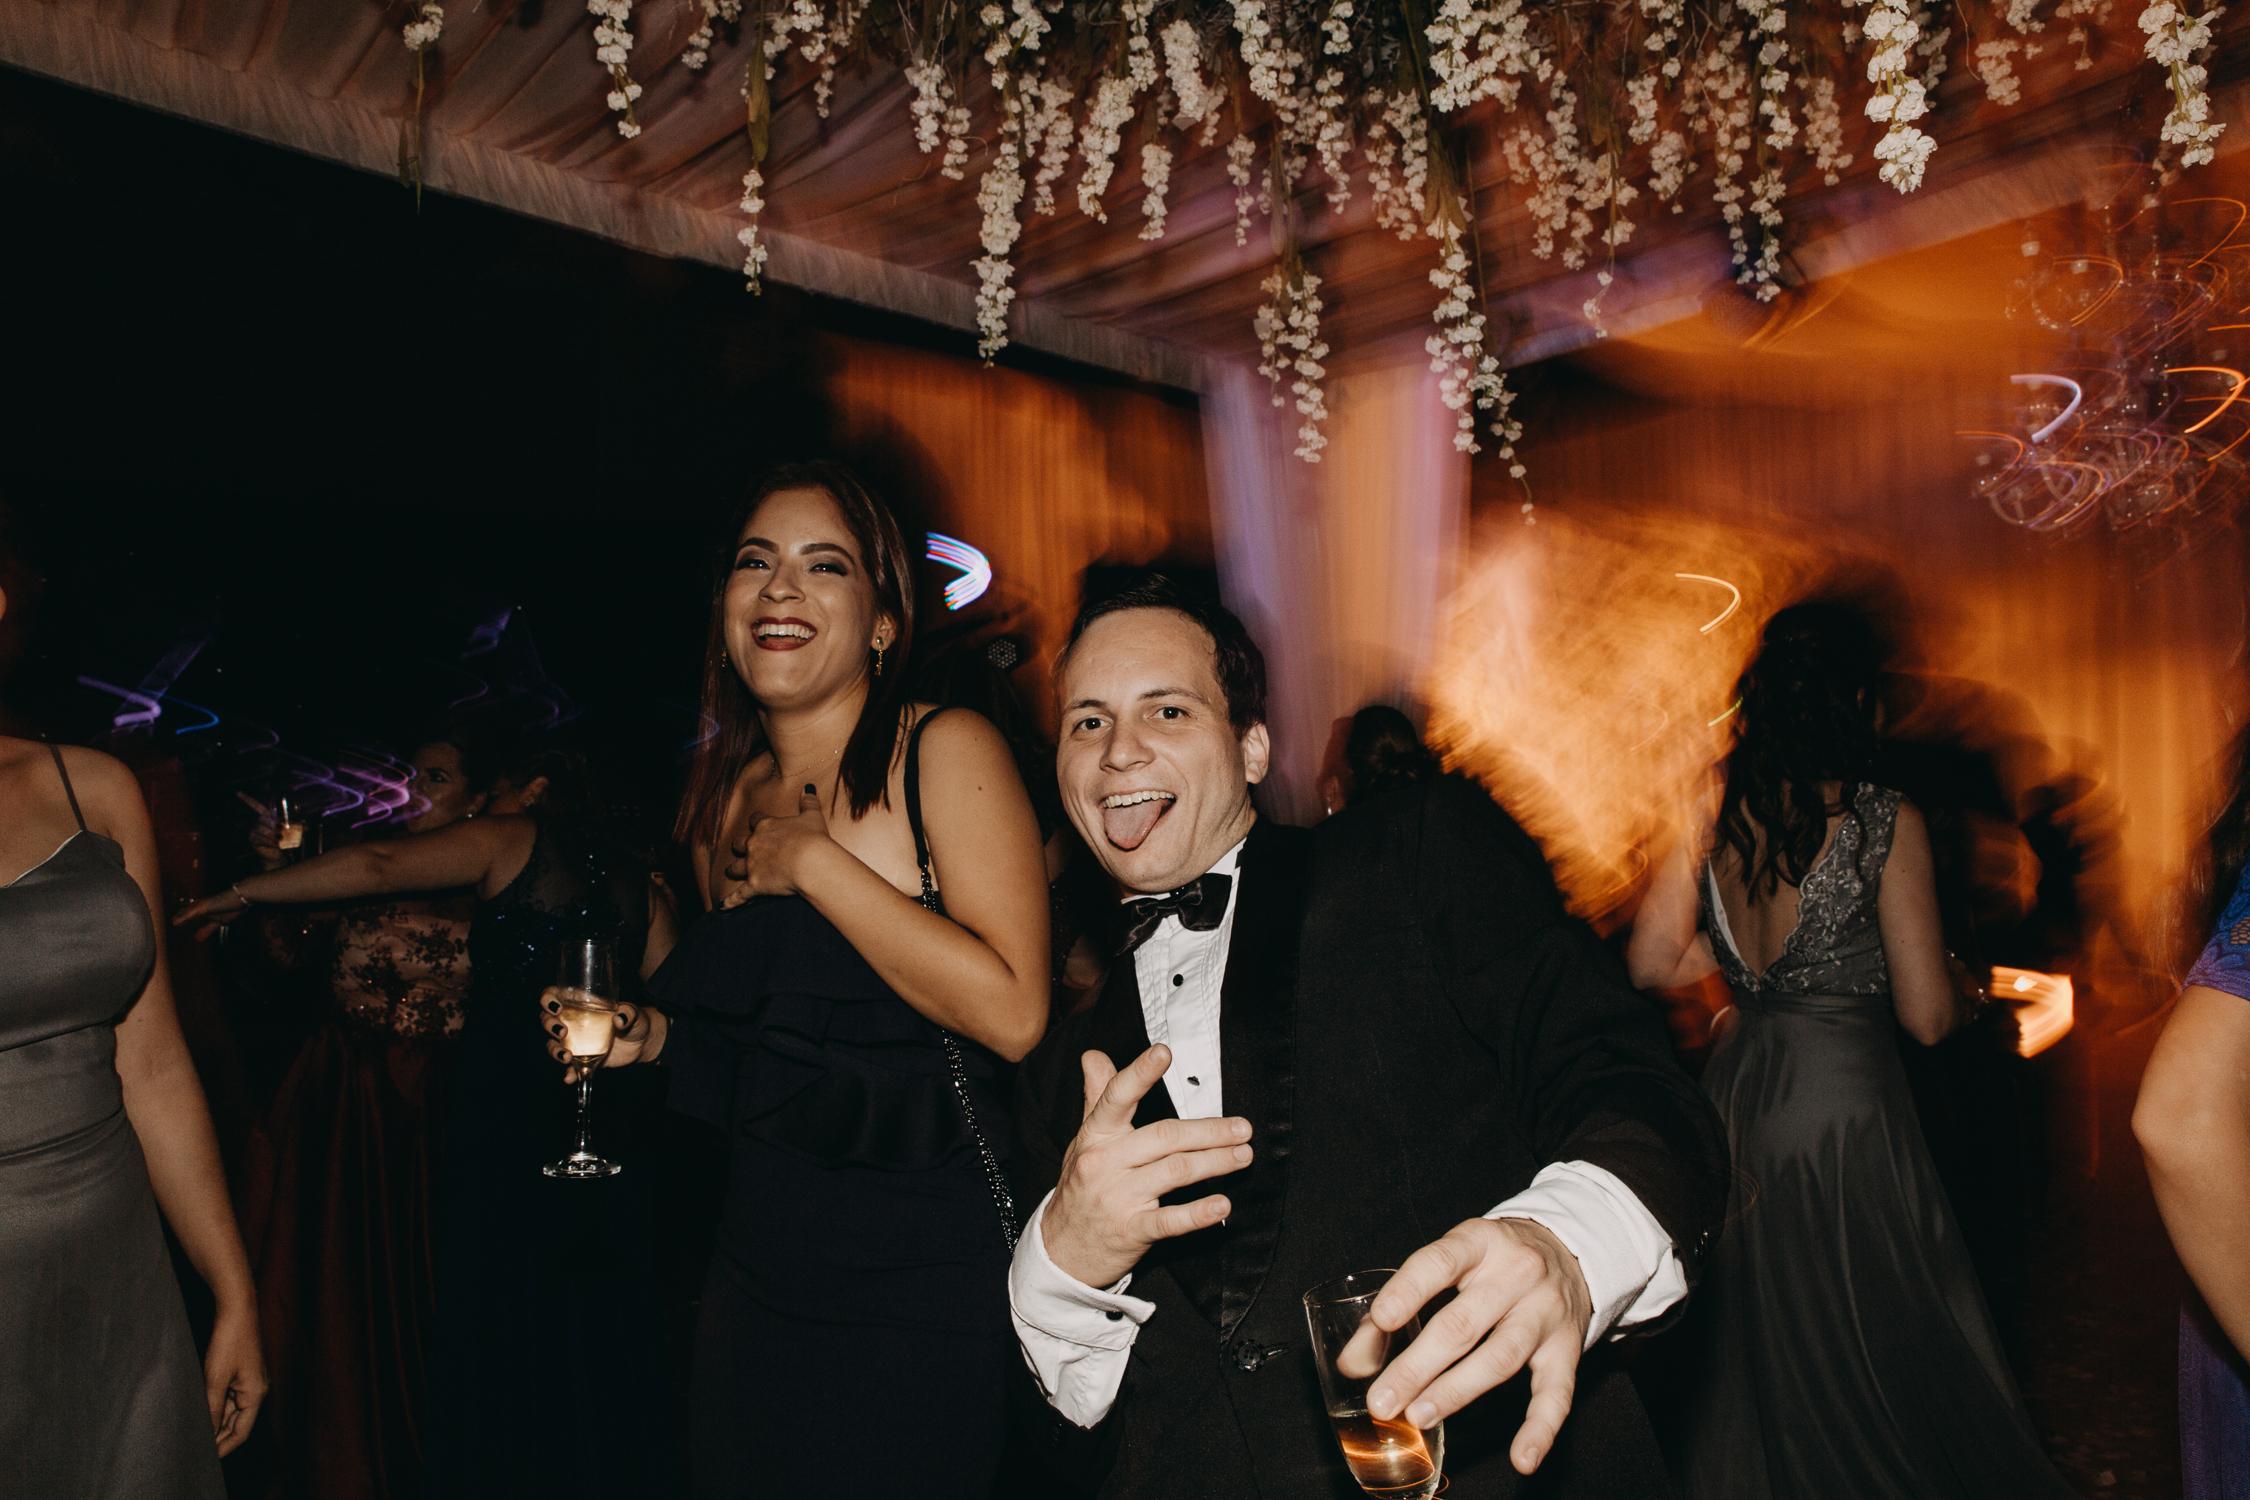 Michelle-Agurto-Fotografia-Bodas-Ecuador-Destination-Wedding-Photographer-Vicky-Javier-220.JPG